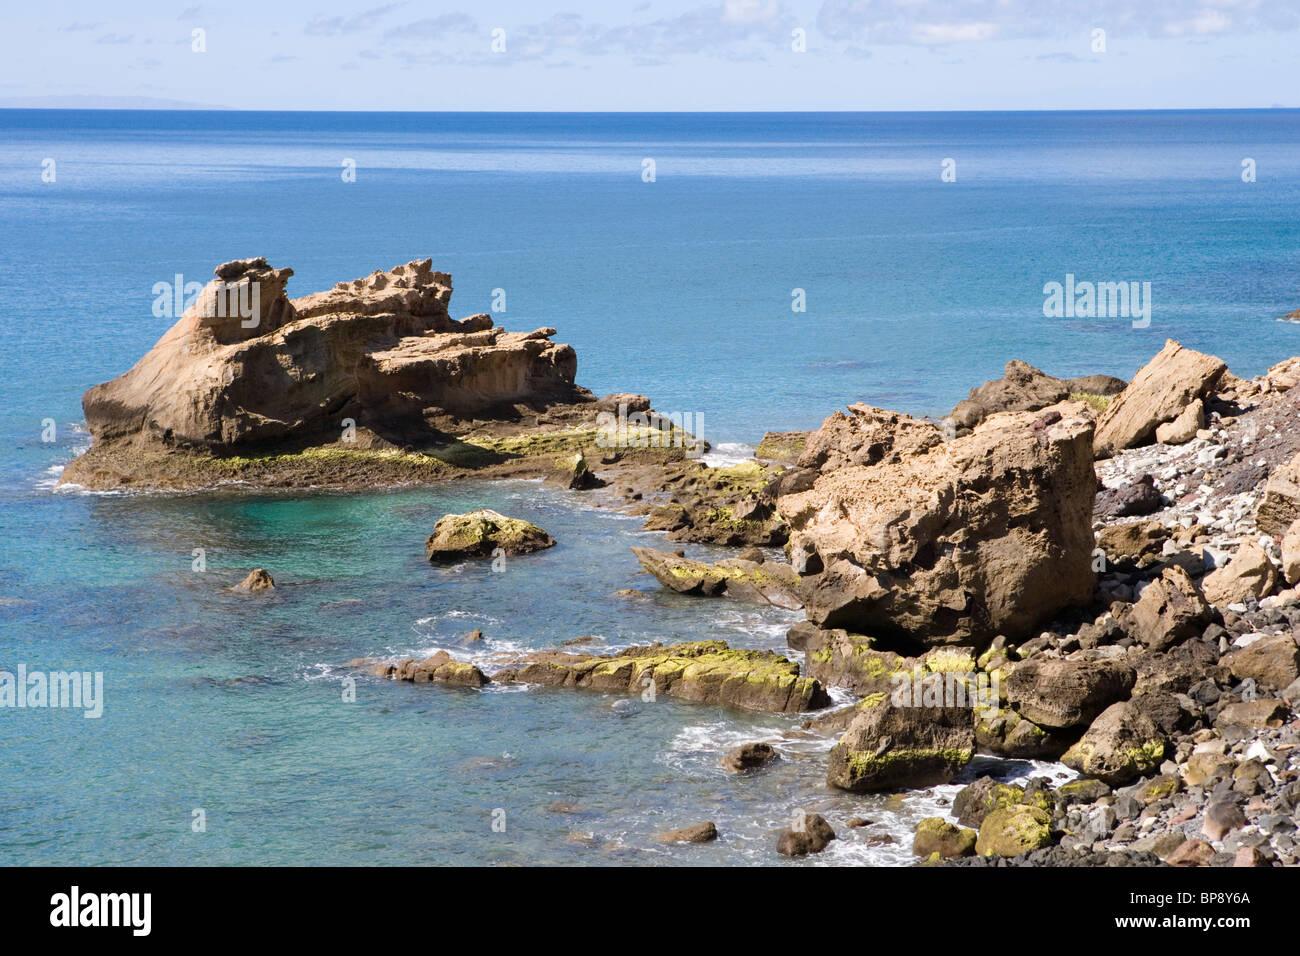 Coastline at Ponta da Gale, Porto Santo, near Madeira, Portugal - Stock Image